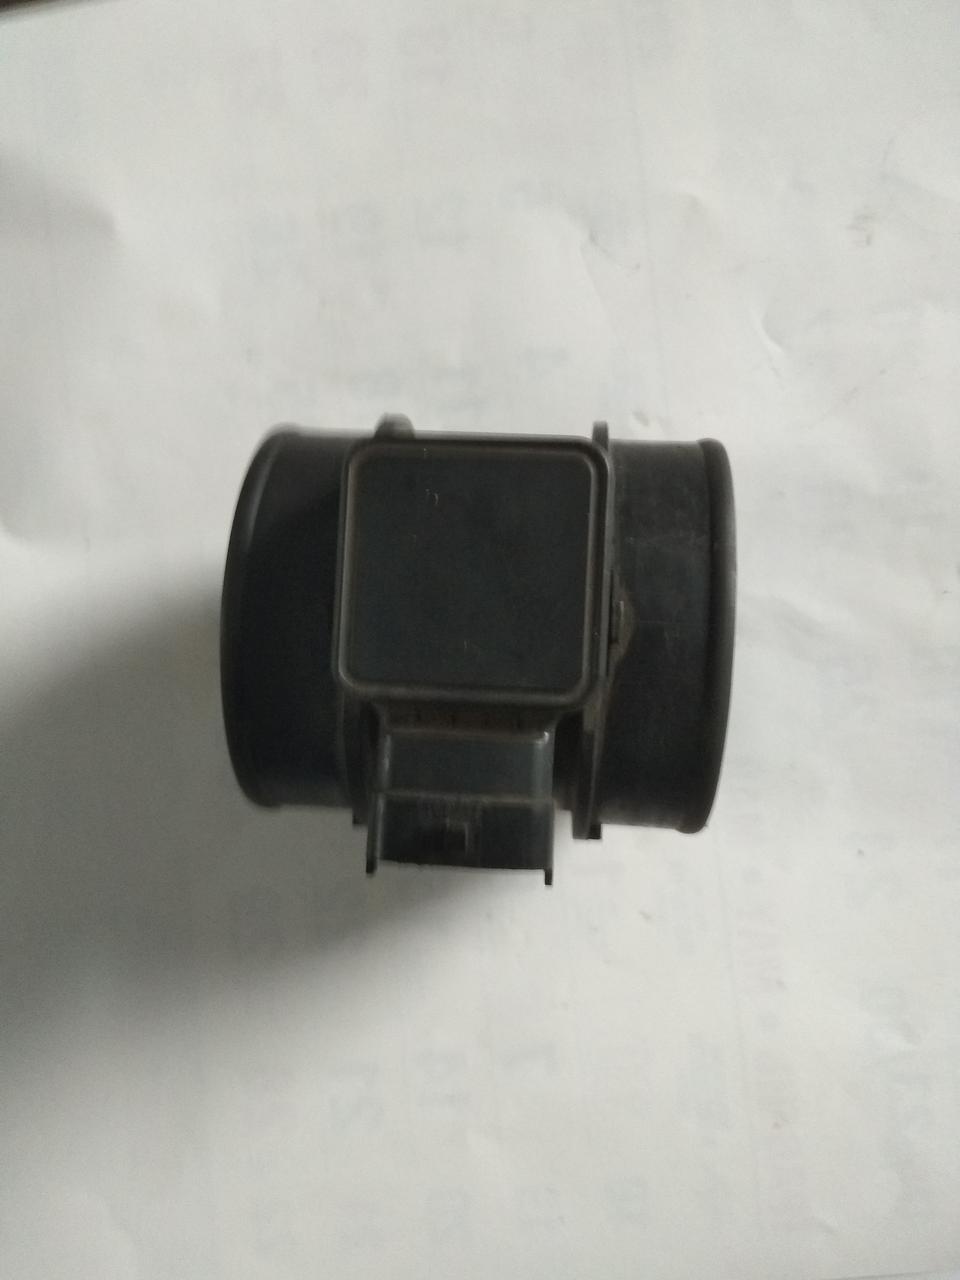 Расходомер воздуха для Opel Astra H, Astra G, Astra GTC, Zafira, Corsa